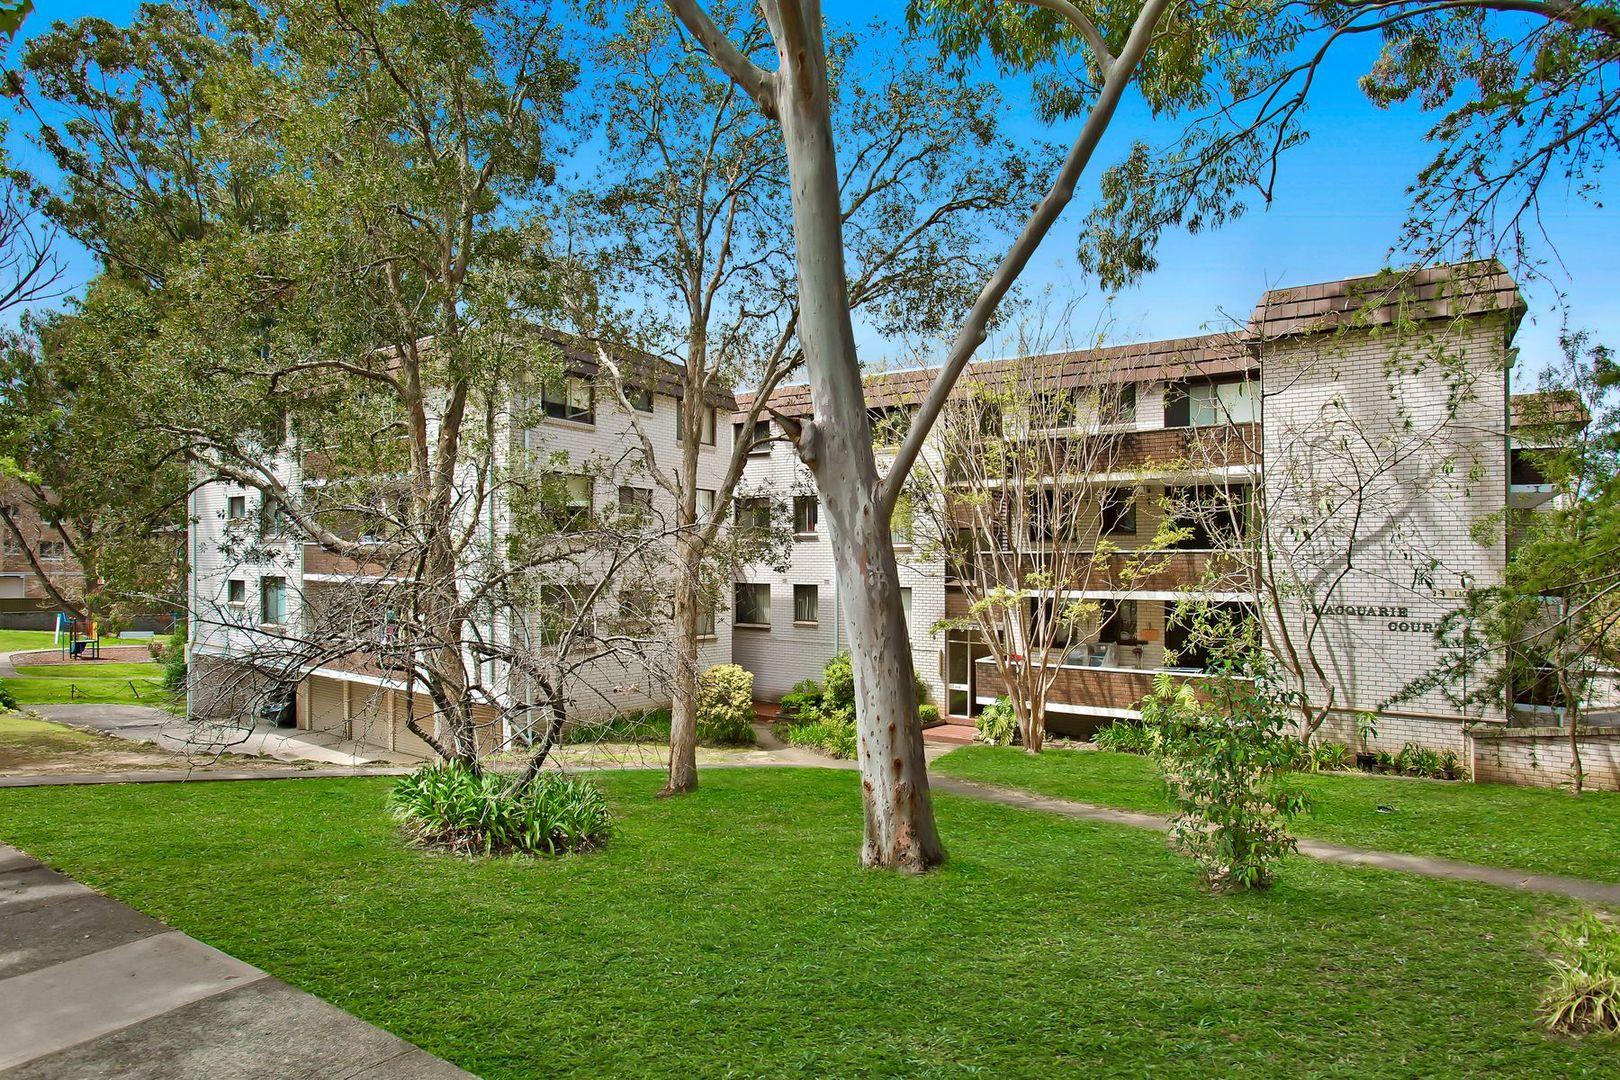 15/2-4 Lachlan Avenue, Macquarie Park NSW 2113, Image 0